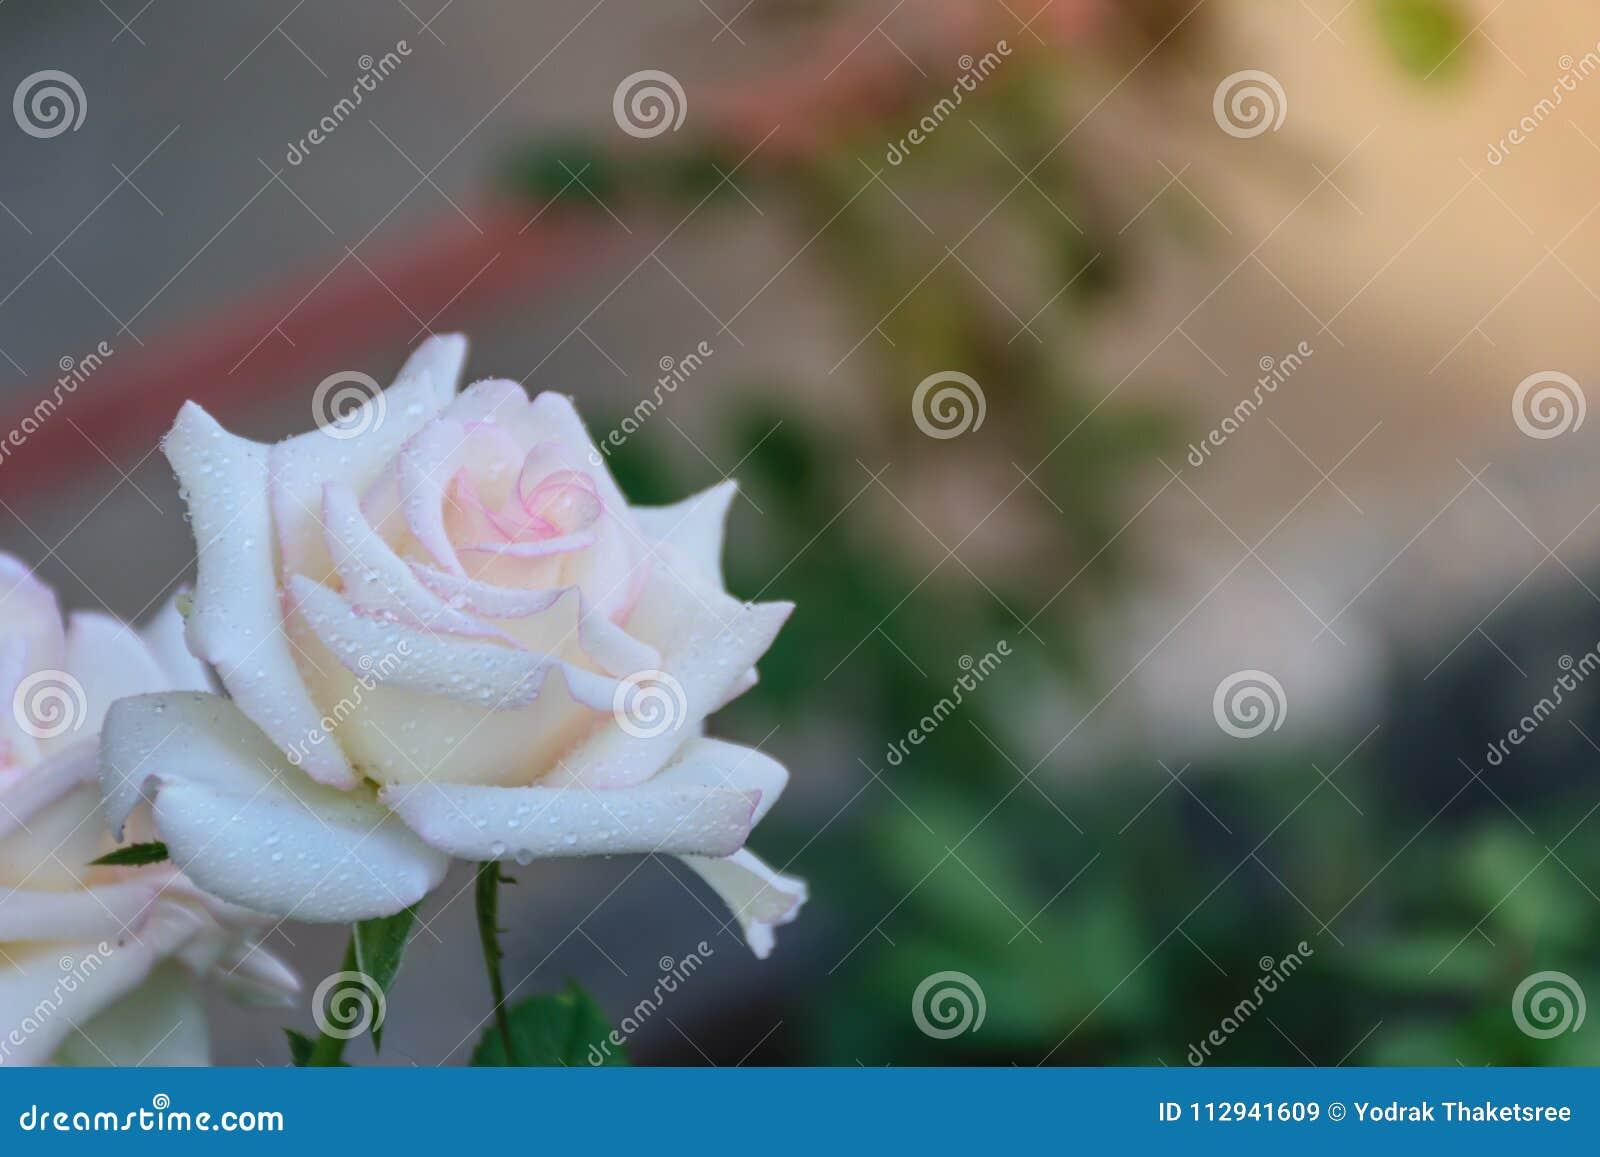 Blooming White Rose Petal Stock Image Image Of Bloom 112941609